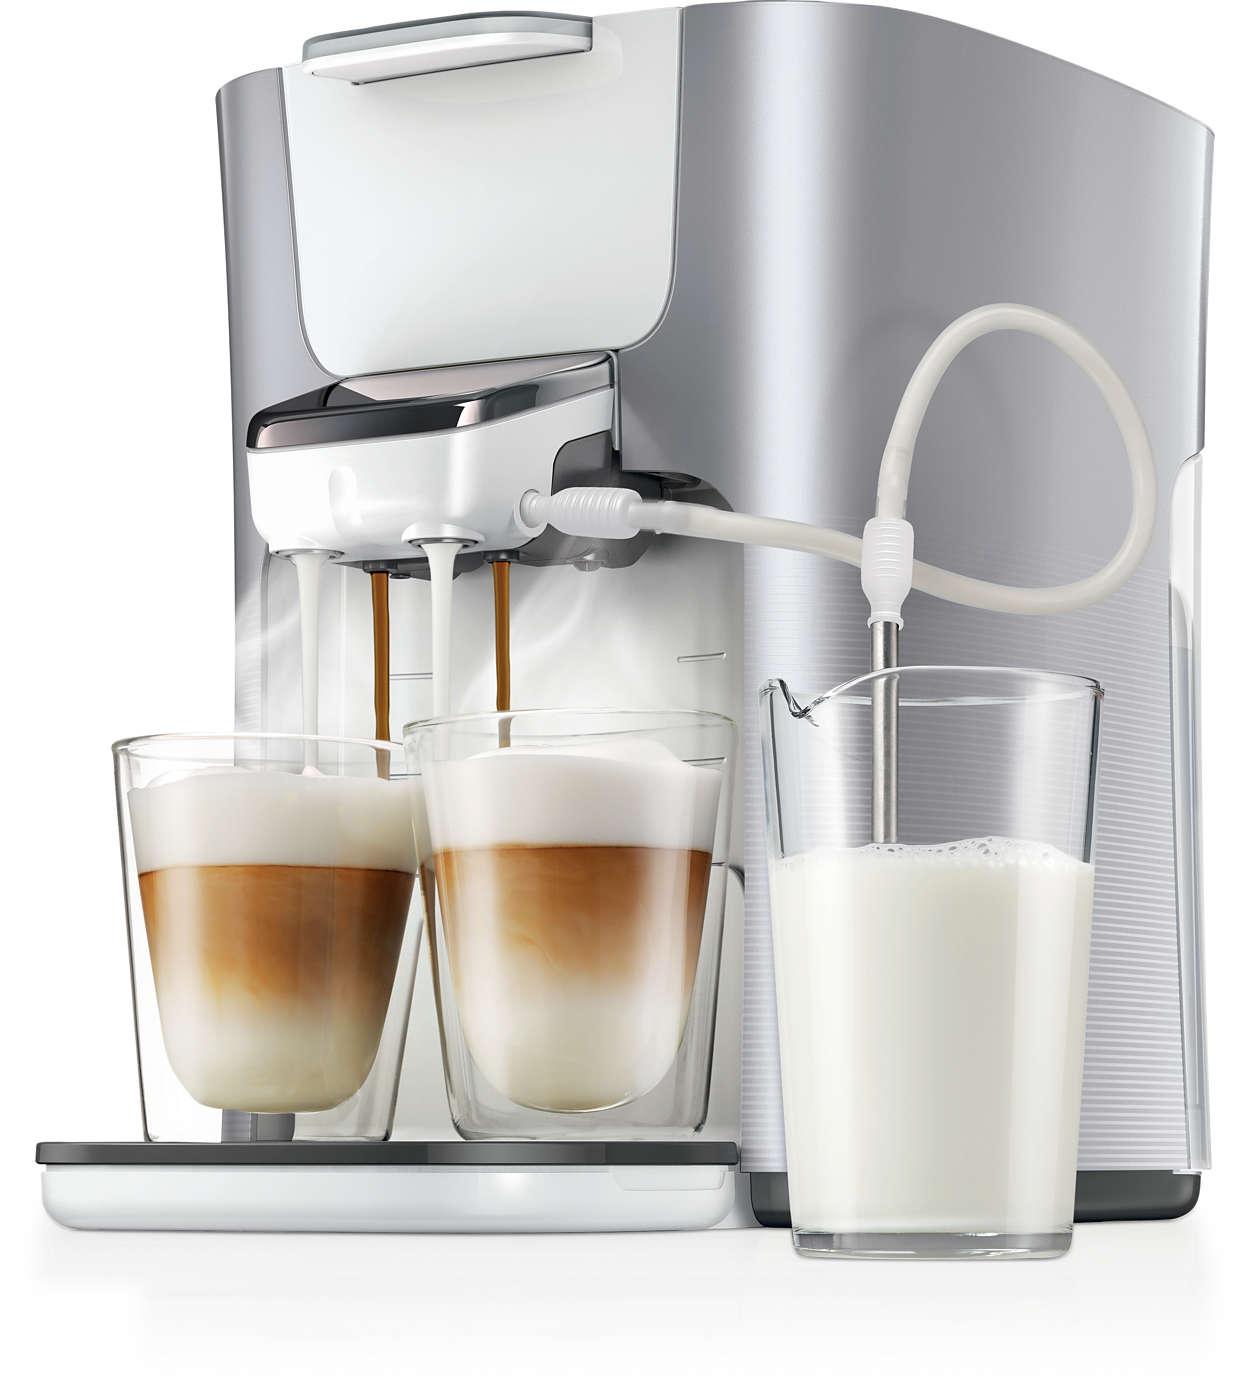 latte duo plus kaffeepadmaschine hd7857 20 senseo. Black Bedroom Furniture Sets. Home Design Ideas